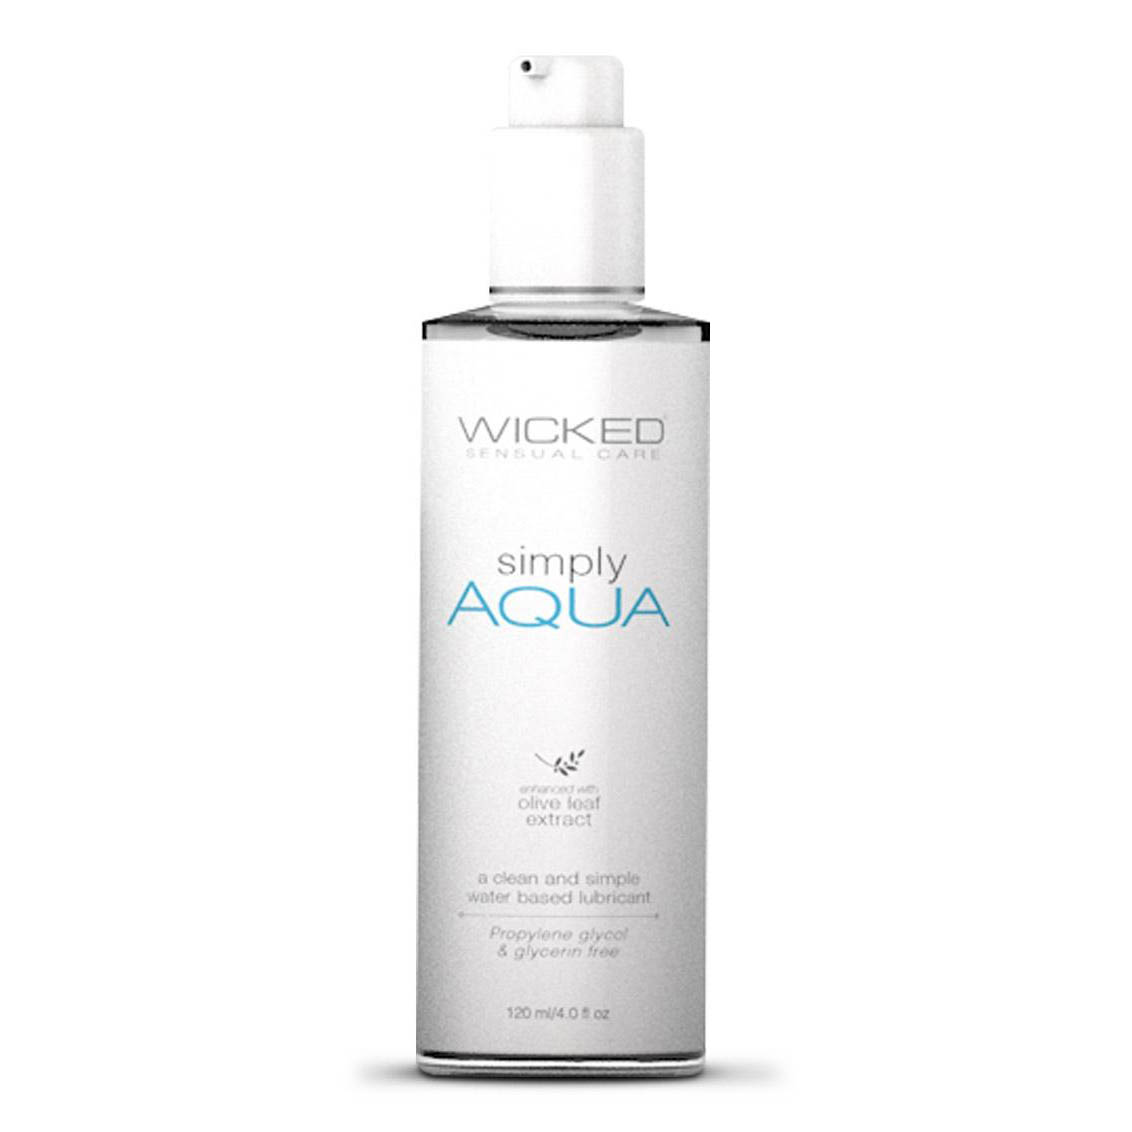 Wicked Aqua Lubricant